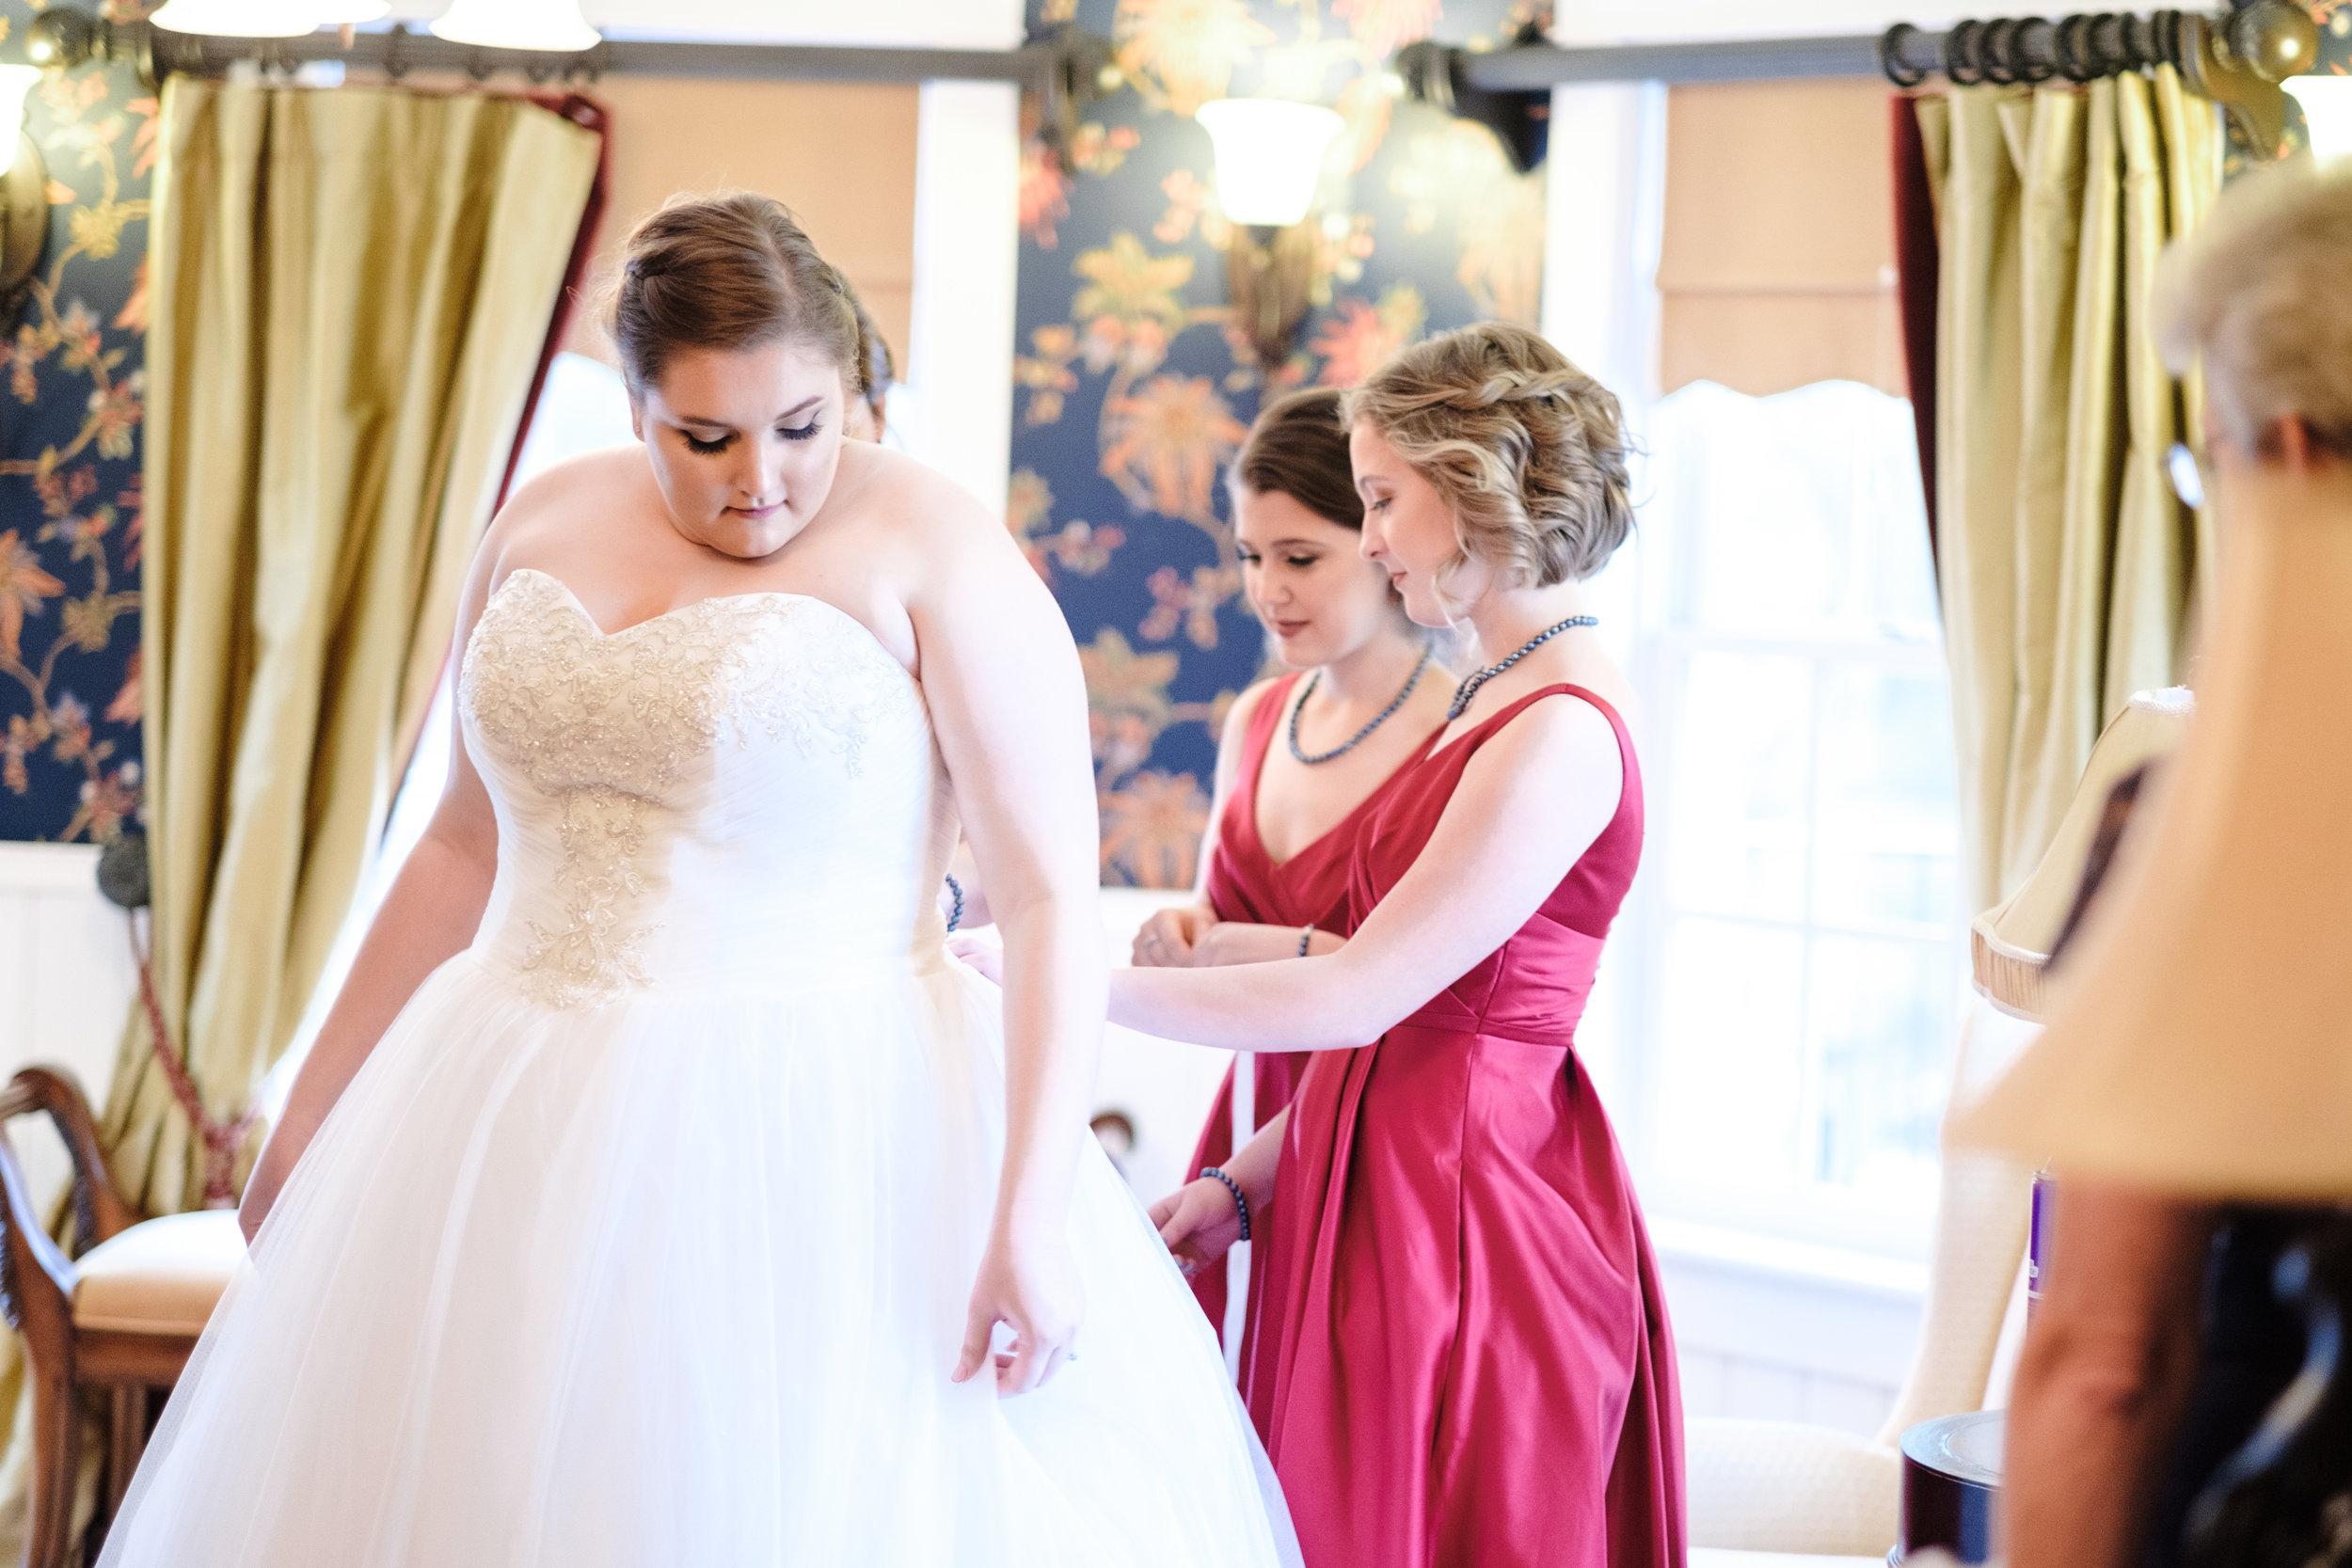 18-12-28 Corinne-Henry-Pavilion-Wedding-64.jpg